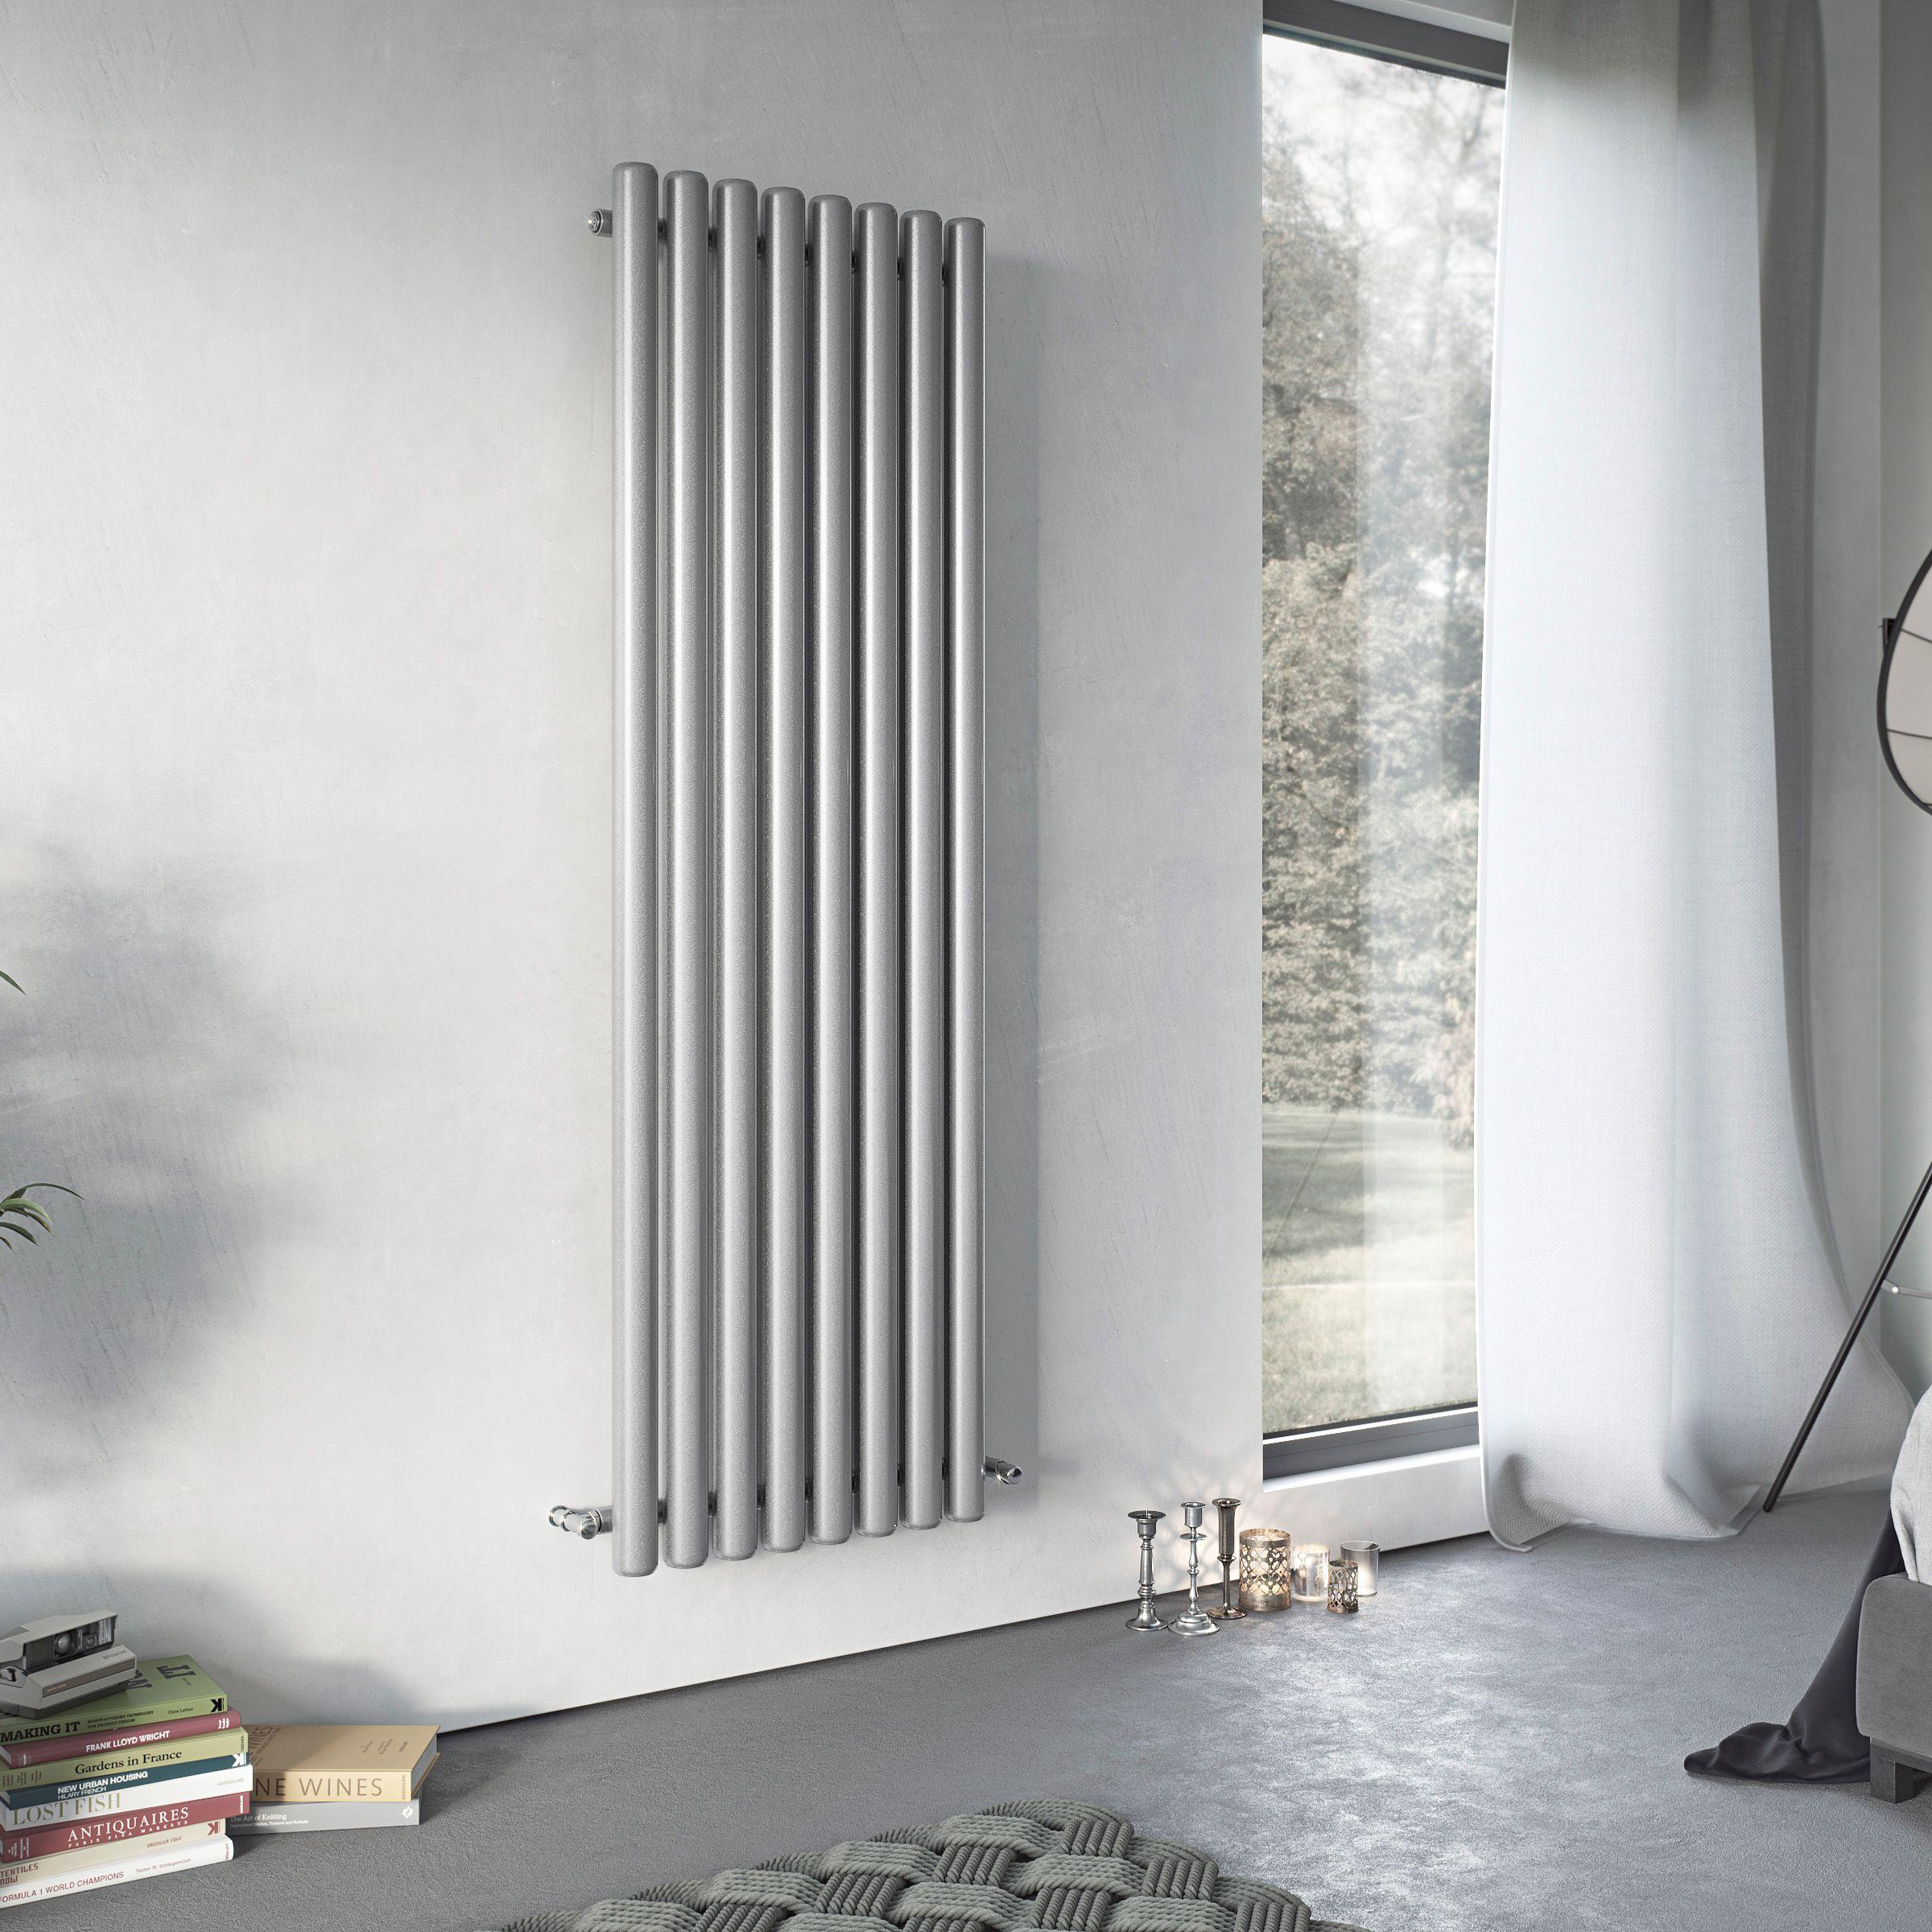 Ximax Vulkan Vertical Radiator Grey (H)1800 mm (W)435